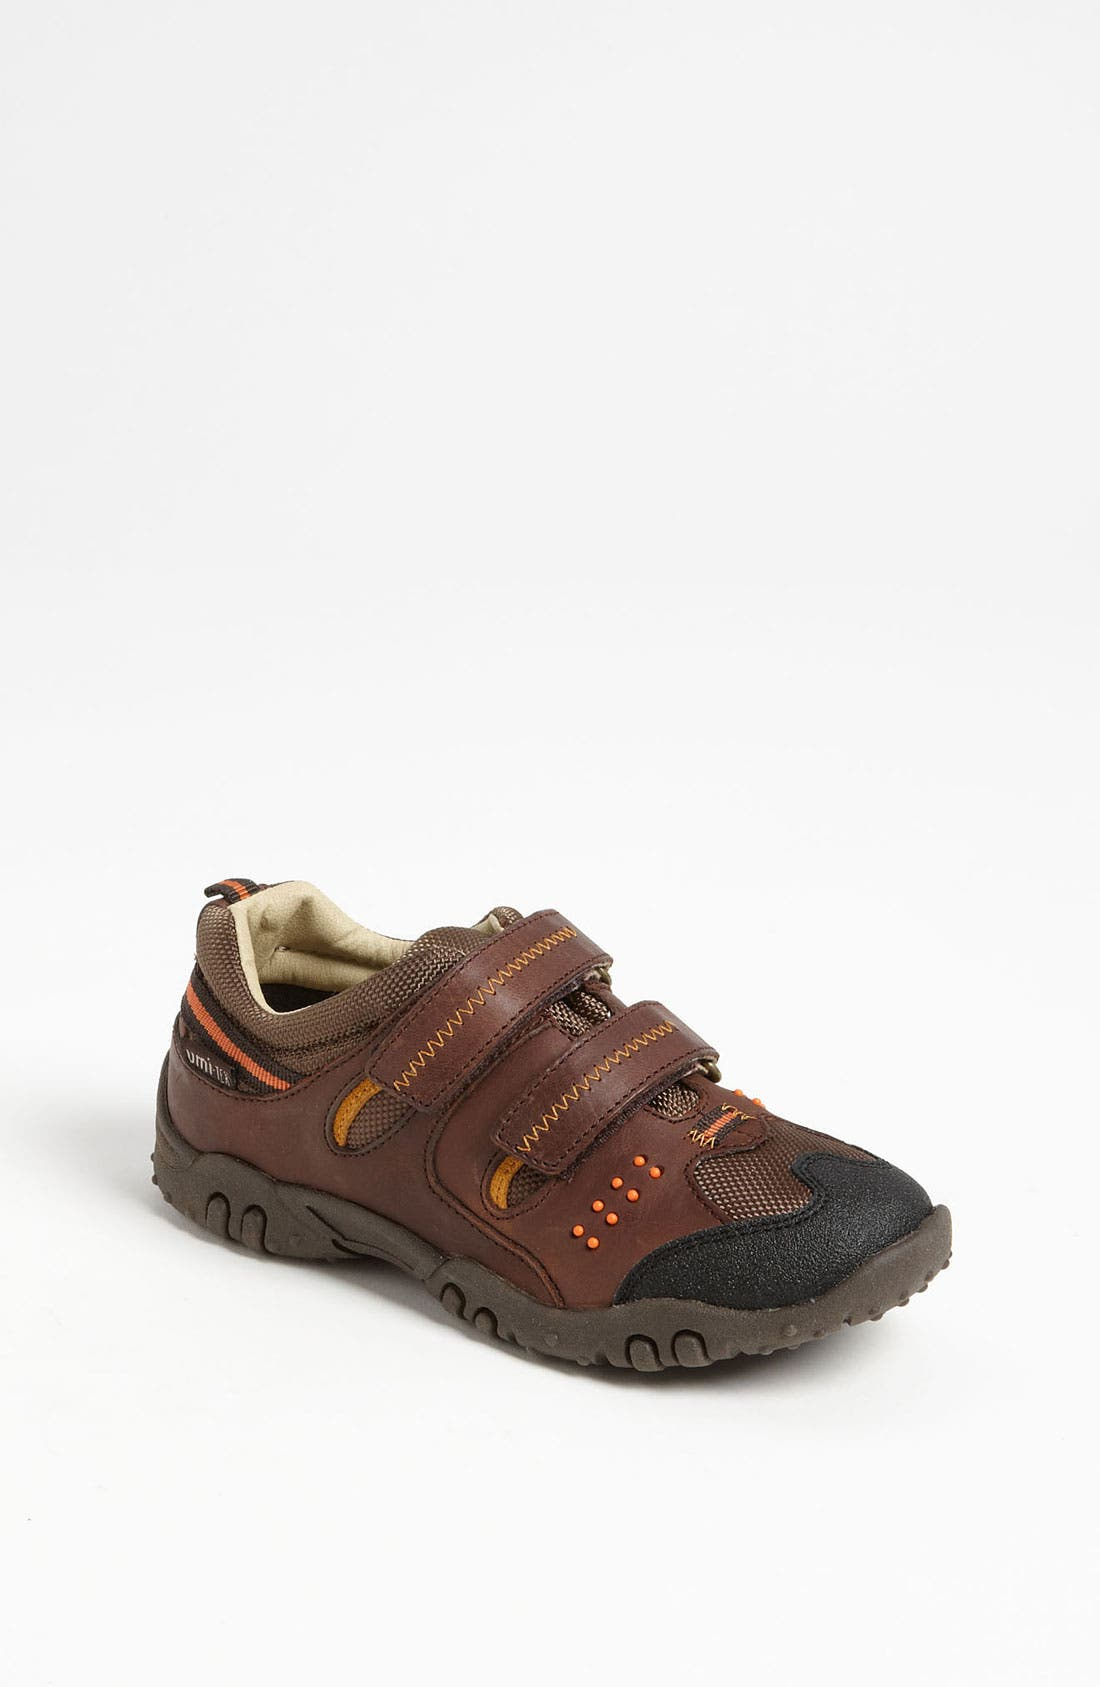 Alternate Image 1 Selected - Umi 'Hayman' Sneaker (Toddler, Little Kid & Big Kid)